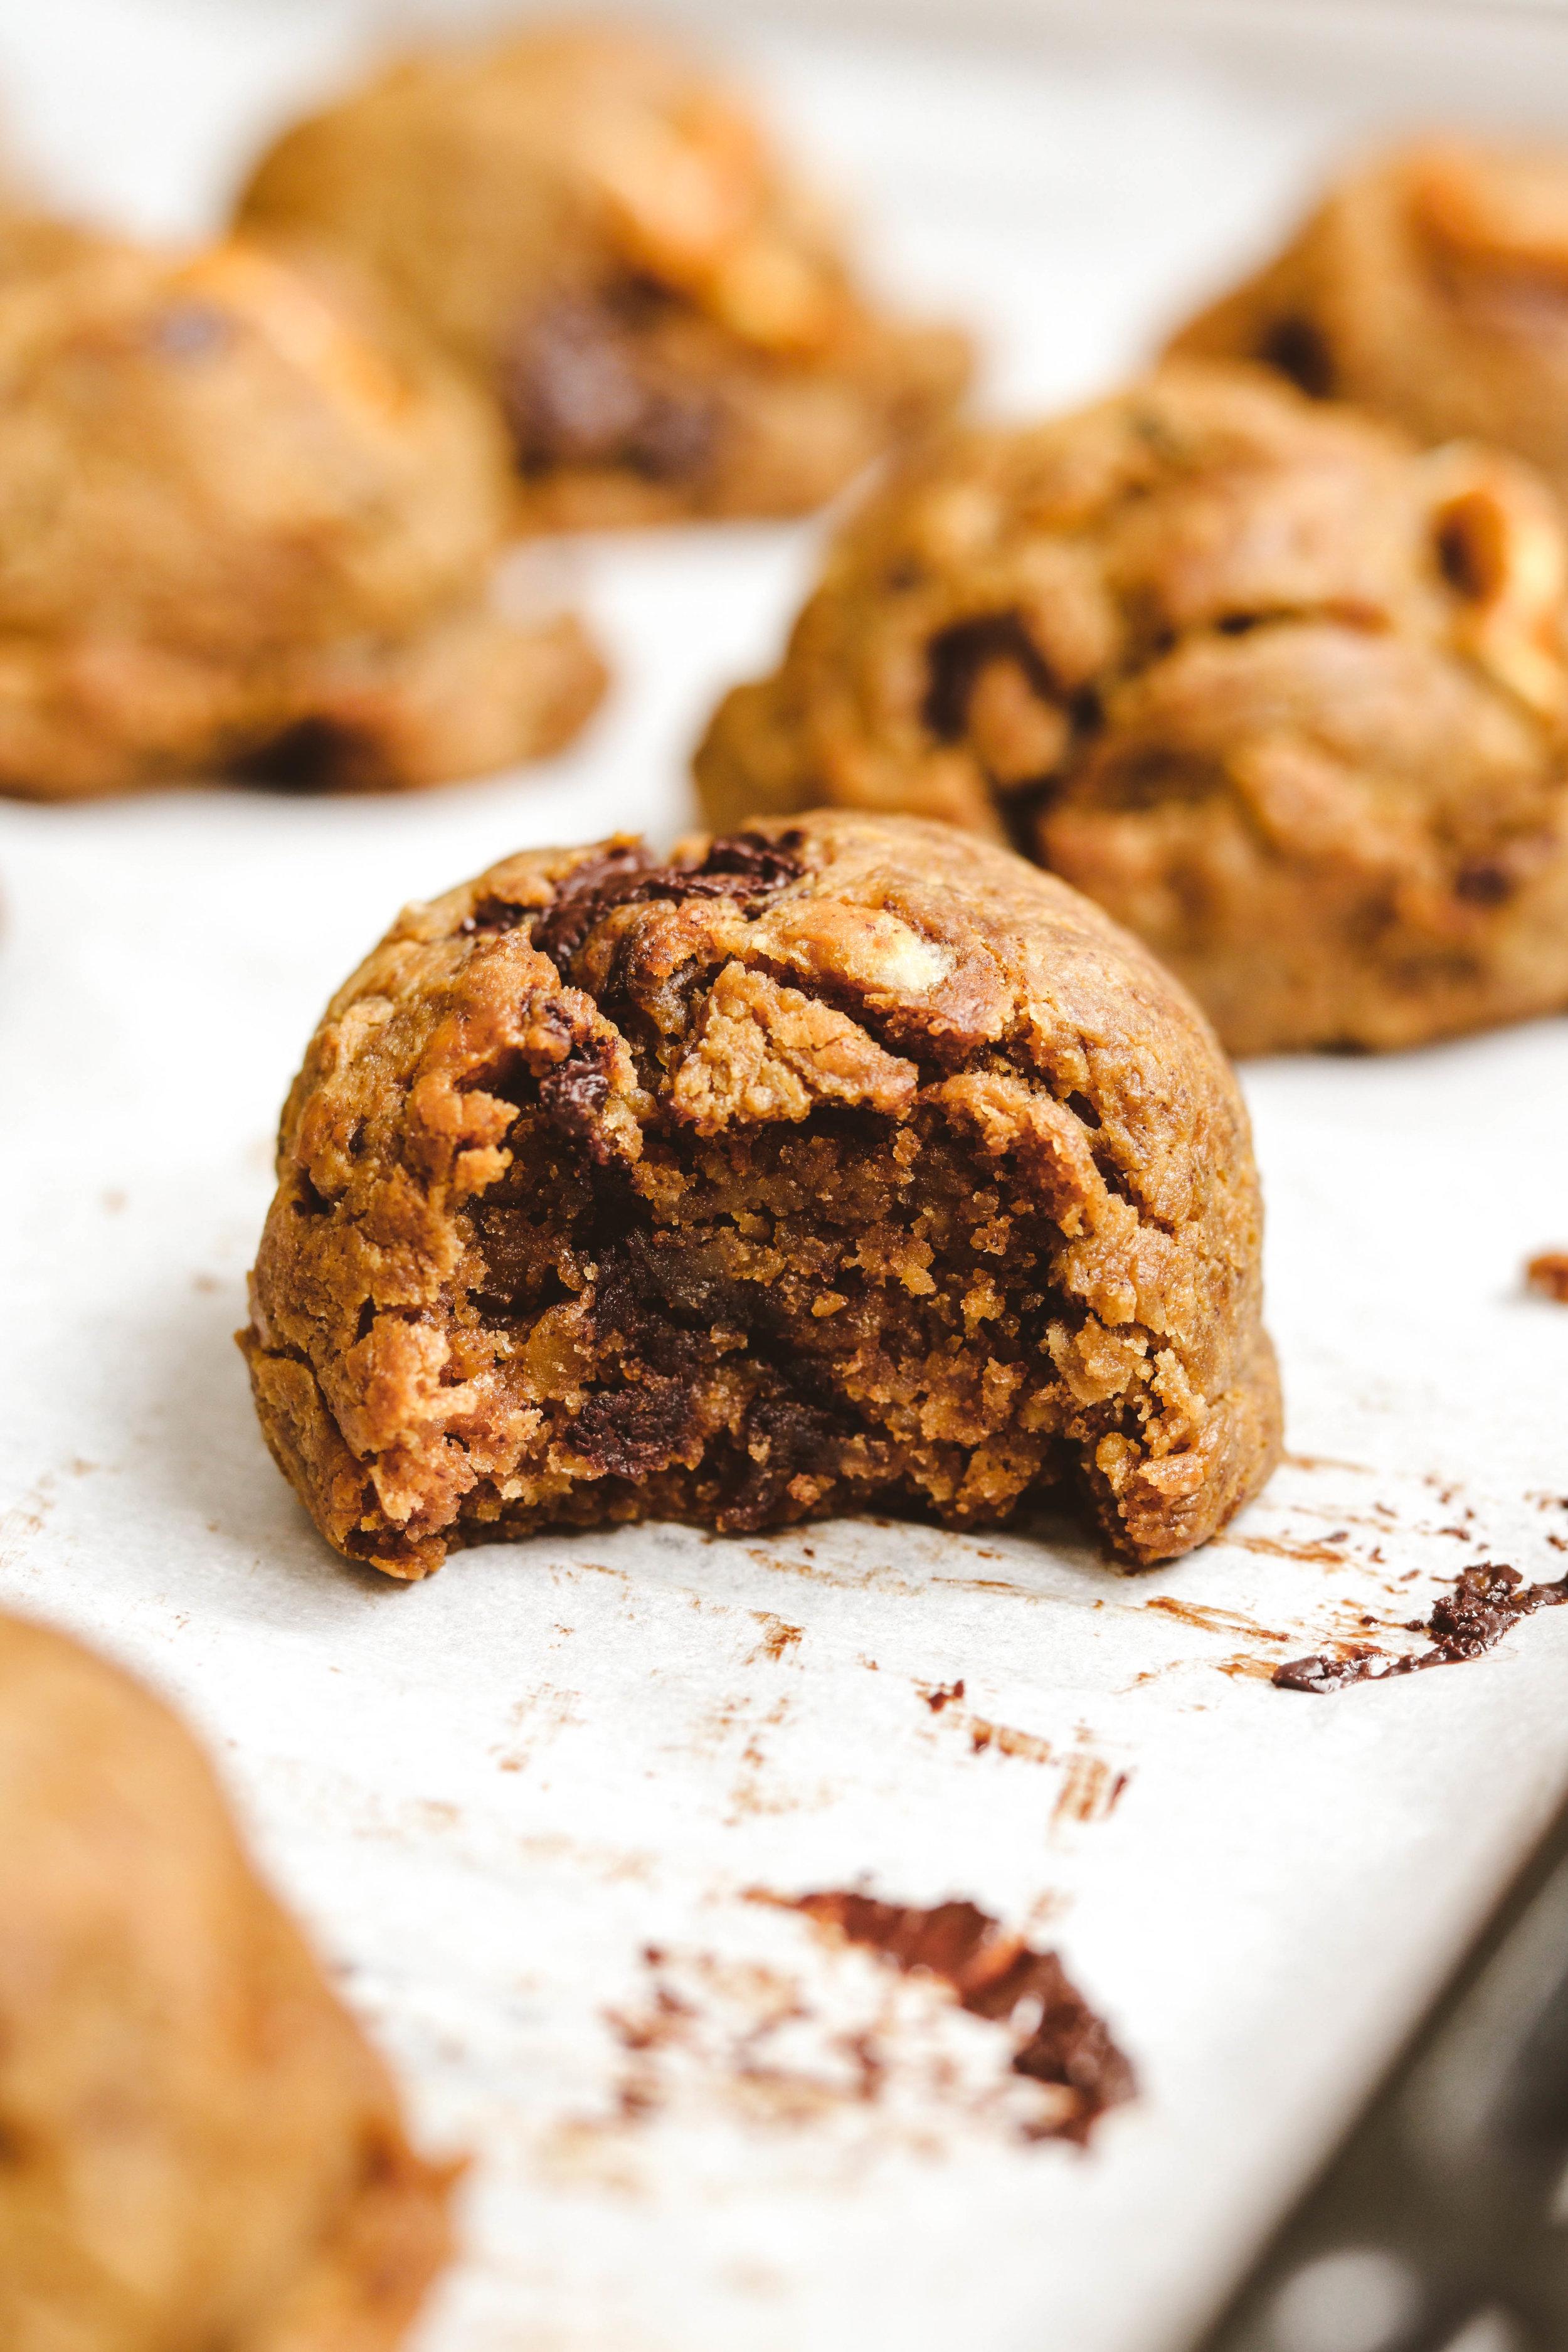 Chocolate Chip Chickpea Cookies bite shot